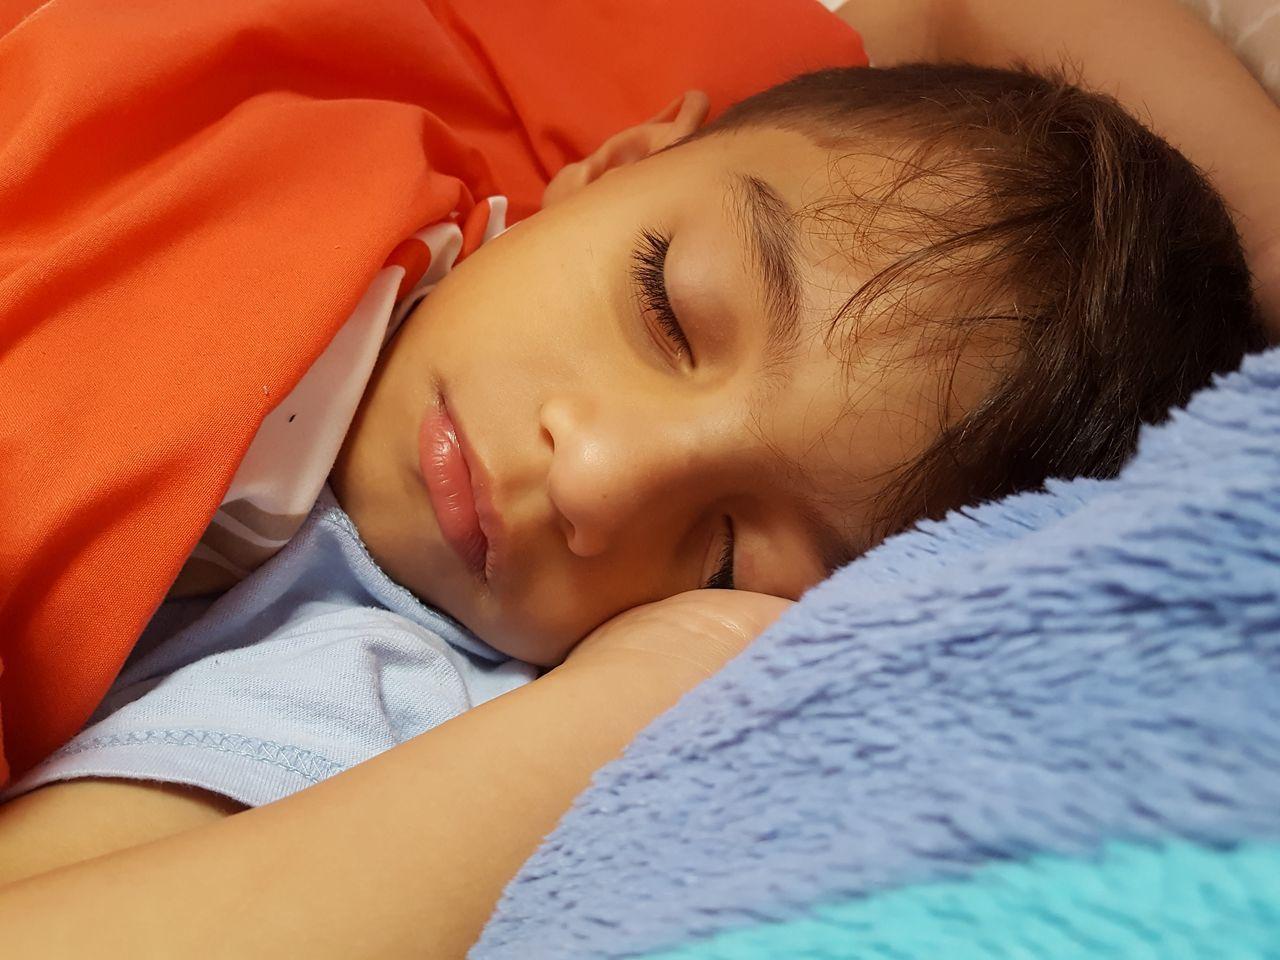 Children Photography Portrait Nephew  Sleeping Morning Beautiful Love